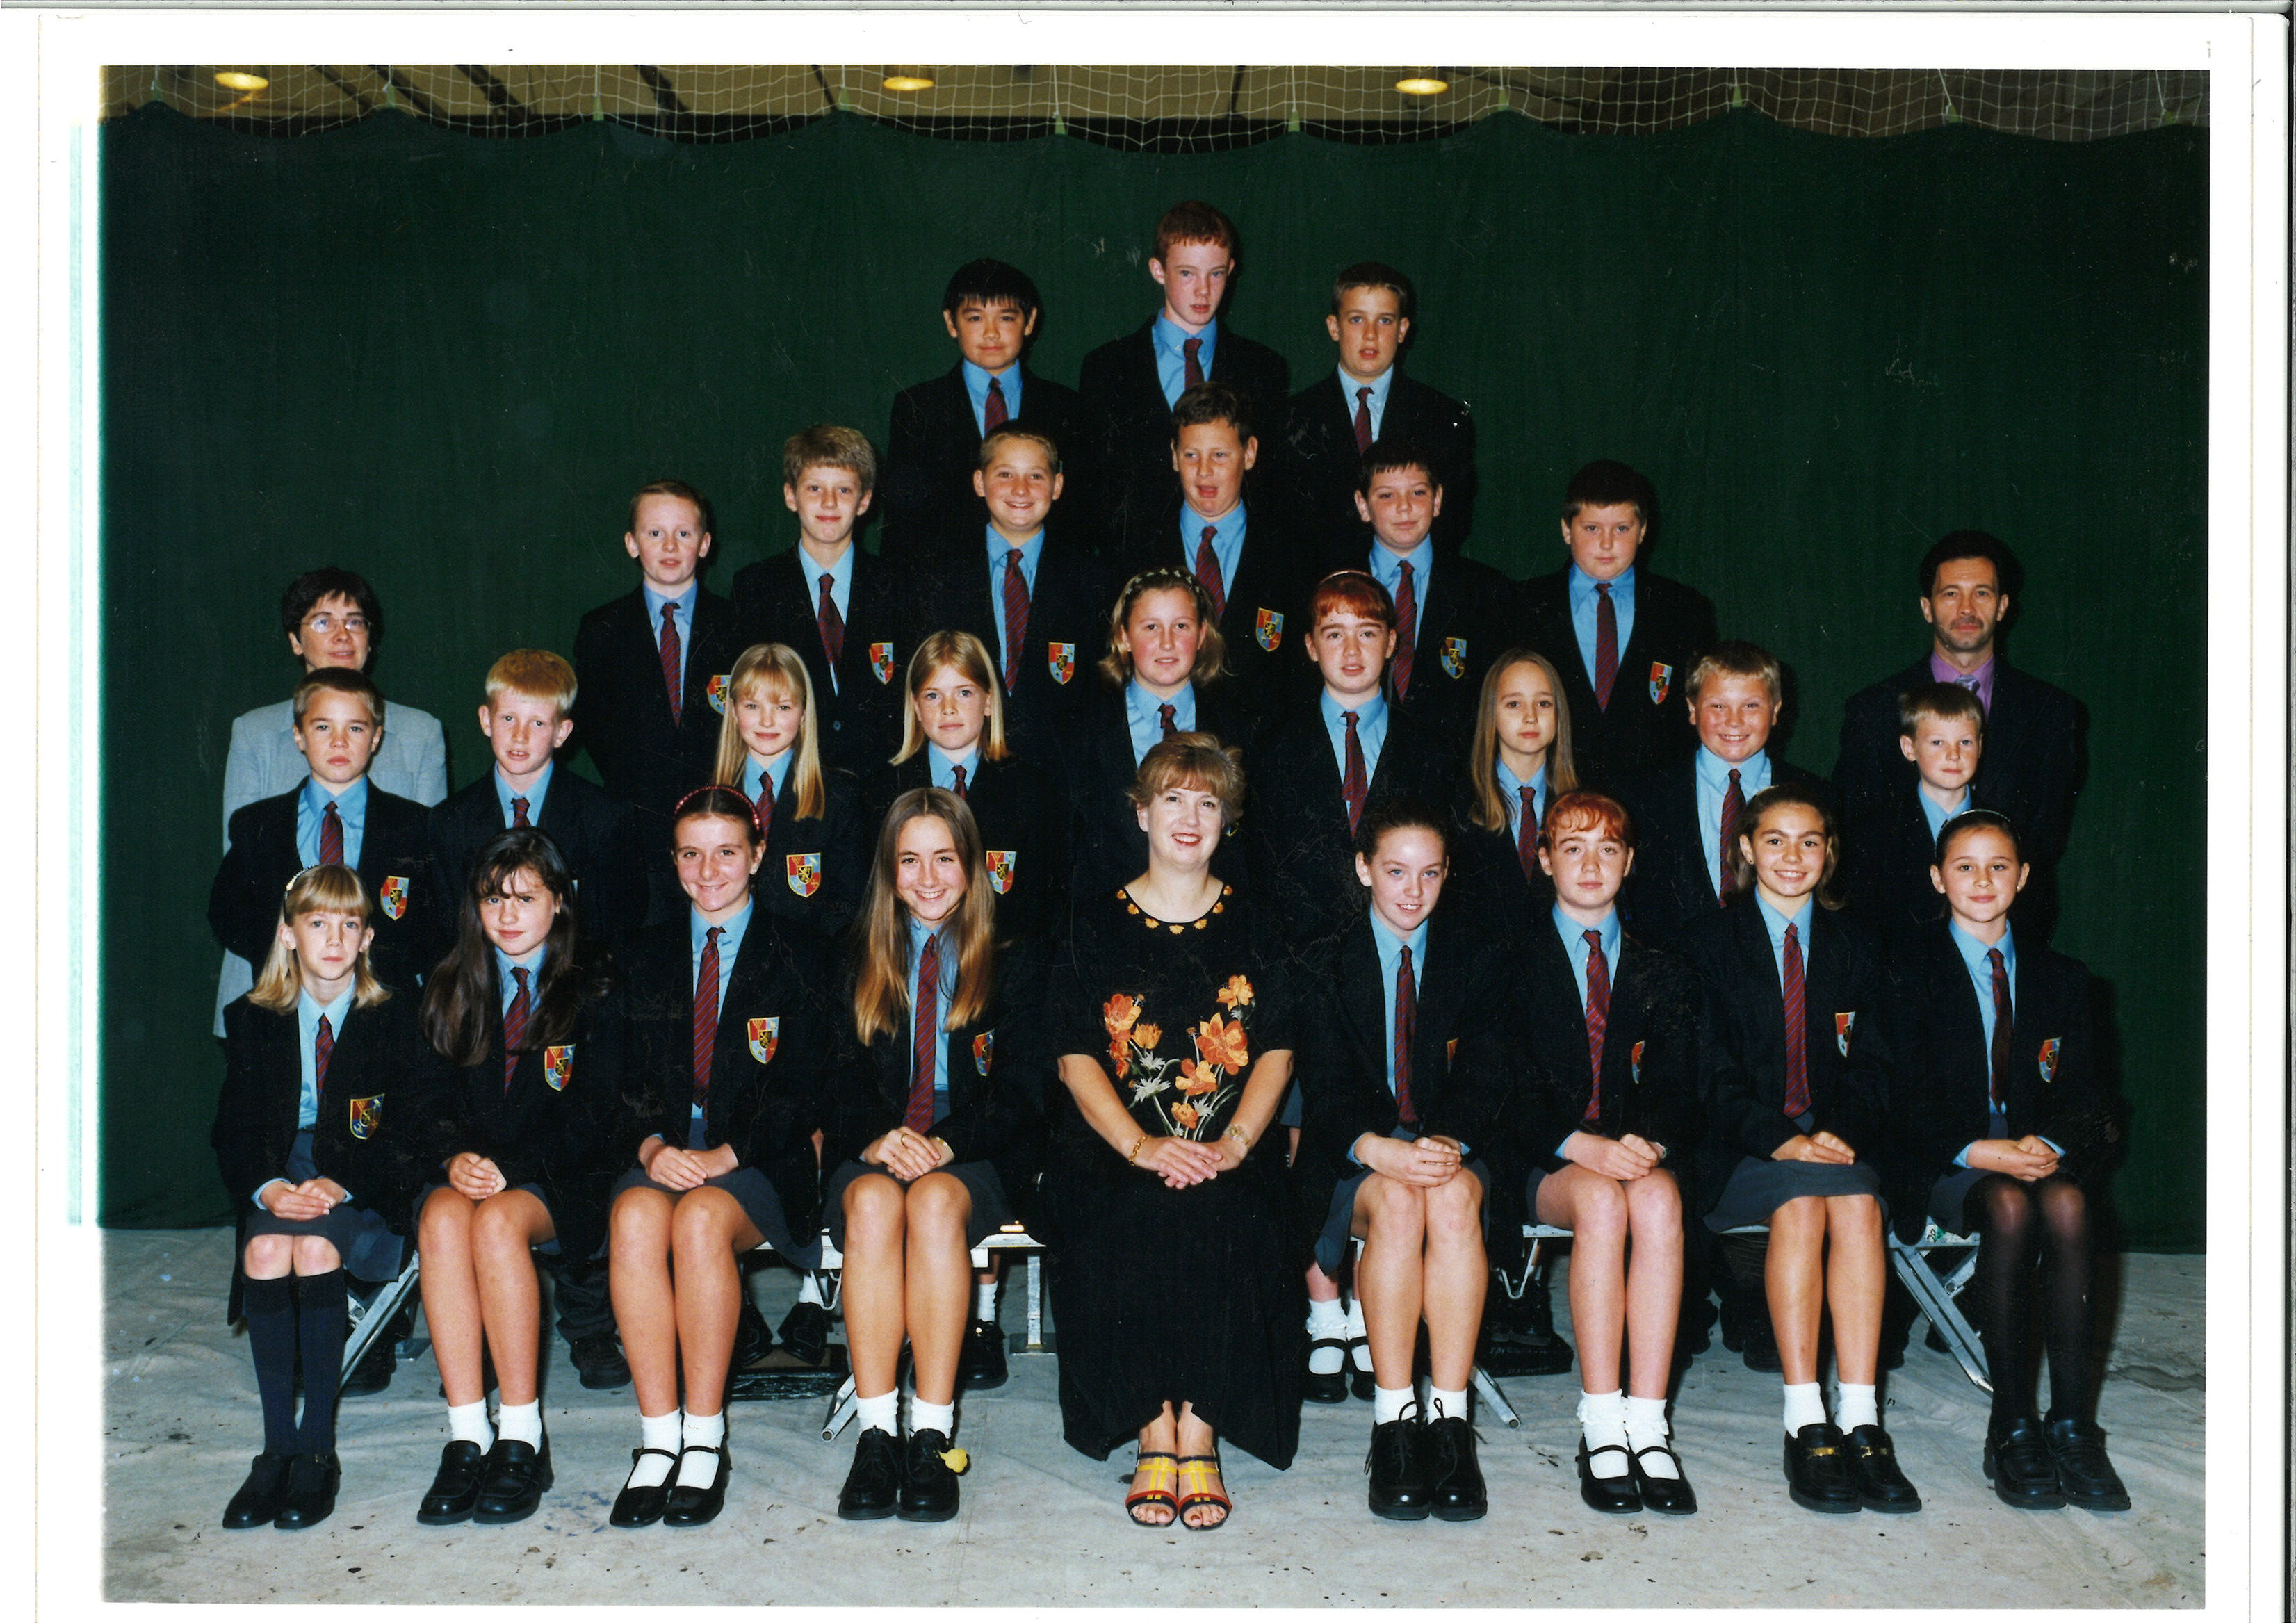 1999 - 2000 Tutor Group 7RR